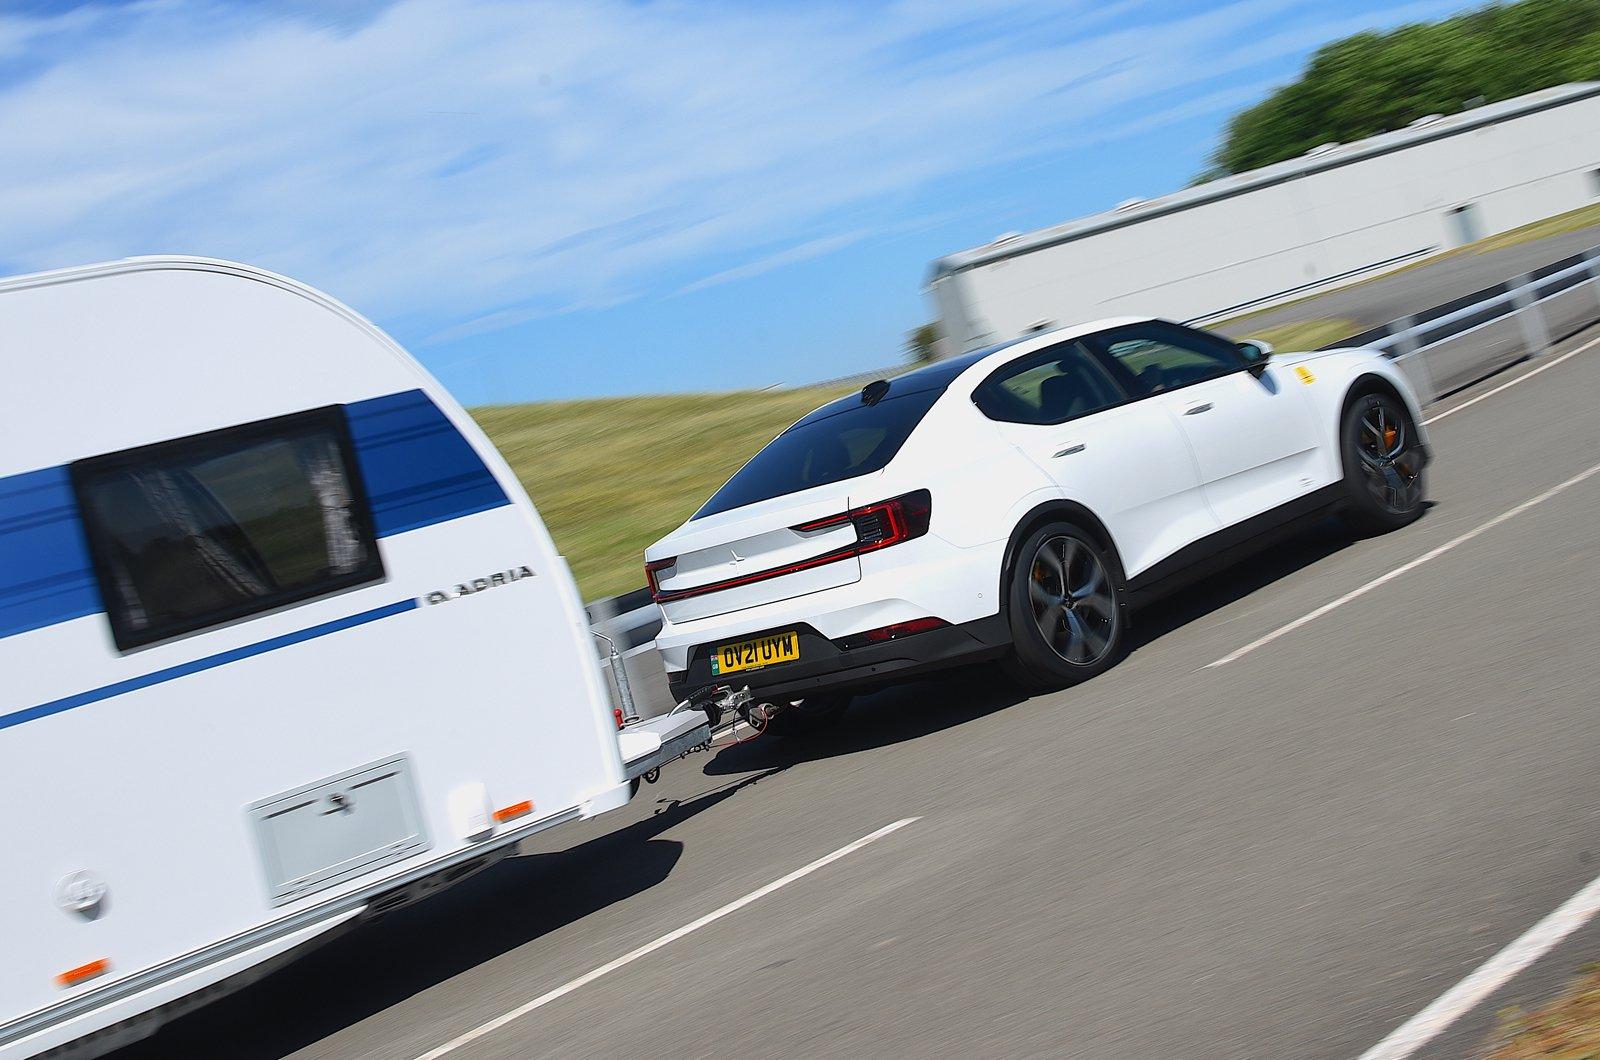 Polestar 2 towing a caravan - rear